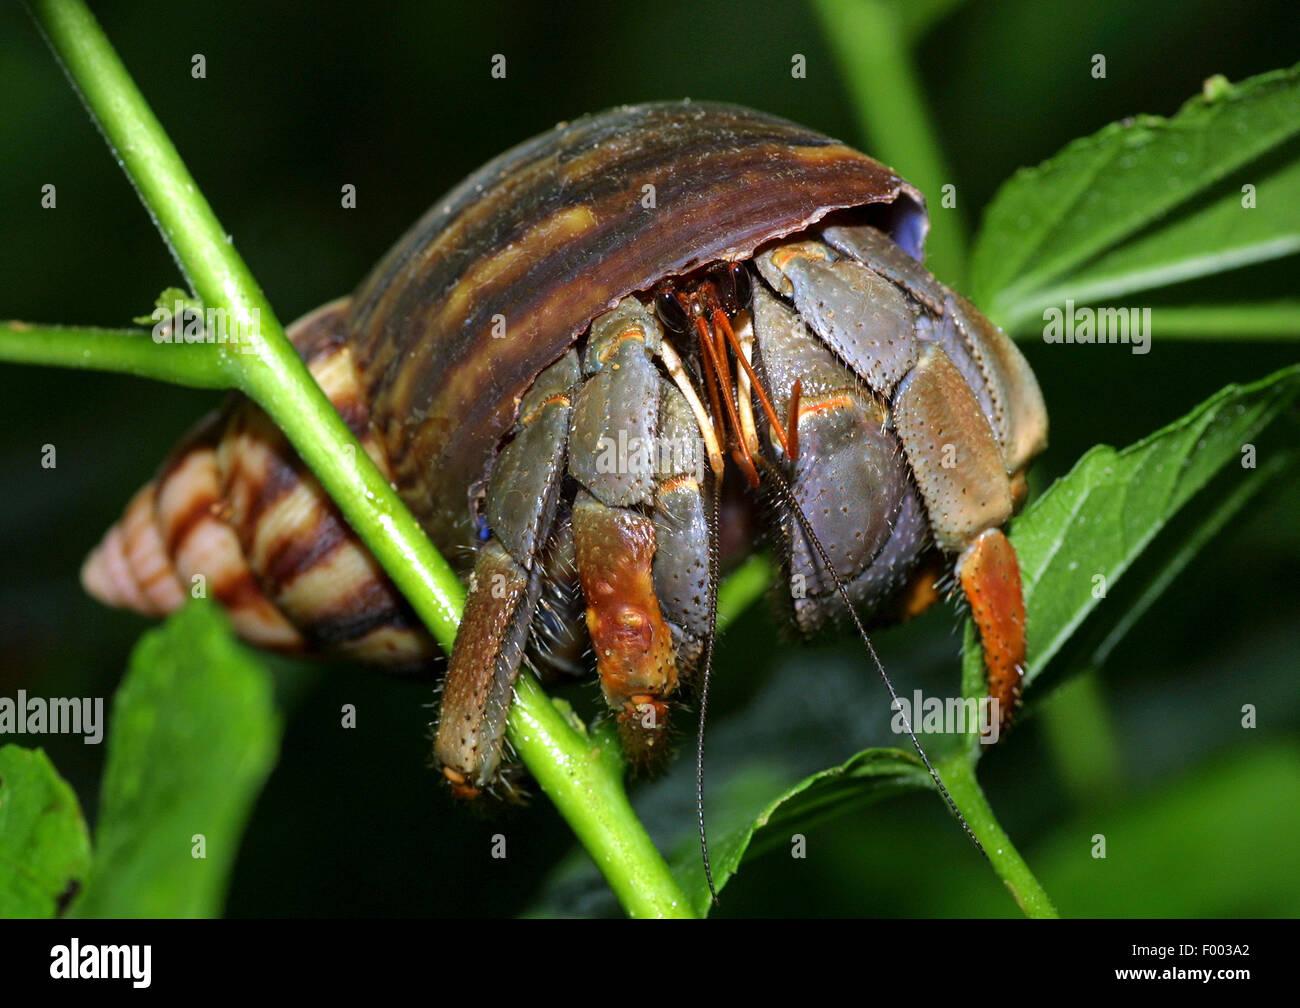 large hermit crab, common hermit crab, soldier crab, soldier hermit crab, Bernhard's hermit crab (Pagurus bernhardus, - Stock Image